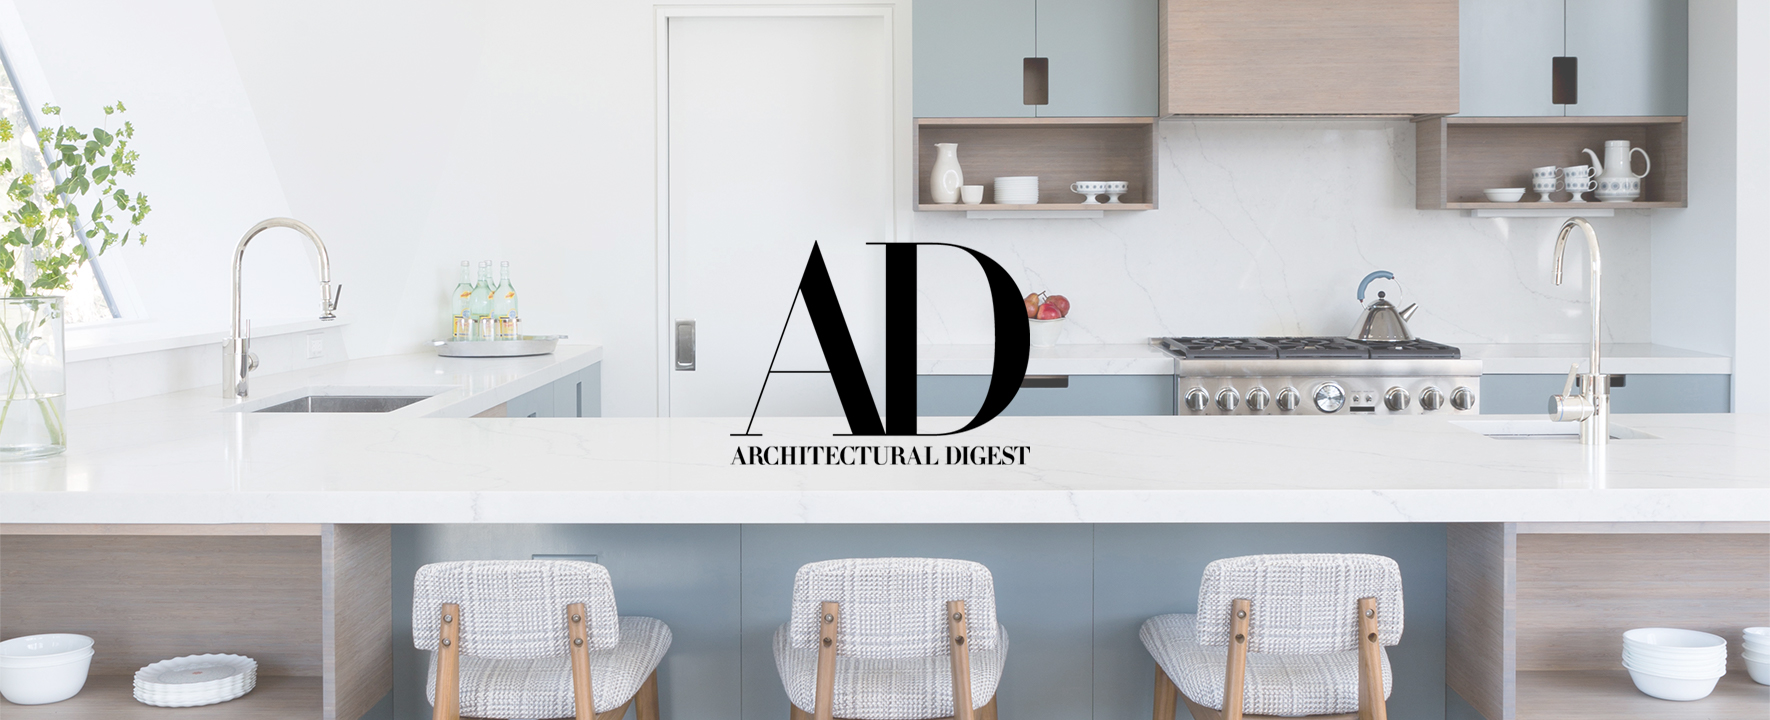 Arhitecural-Digest-Banner.jpg